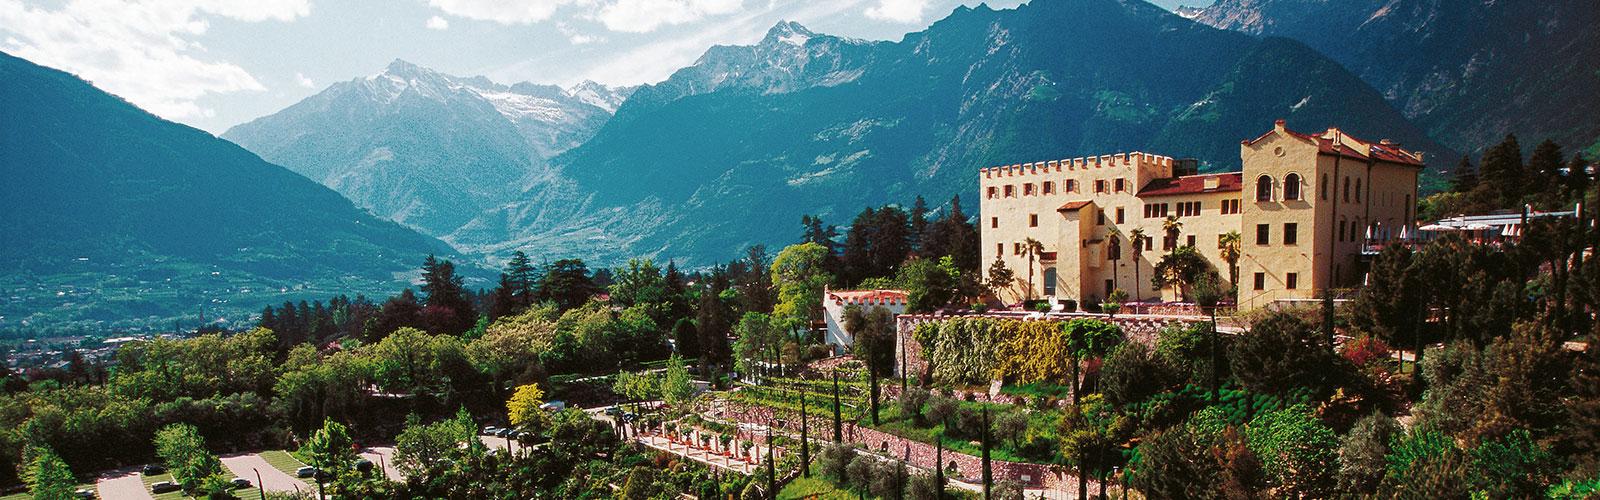 Giardino Botanico Castel Trauttmansdorff A Merano